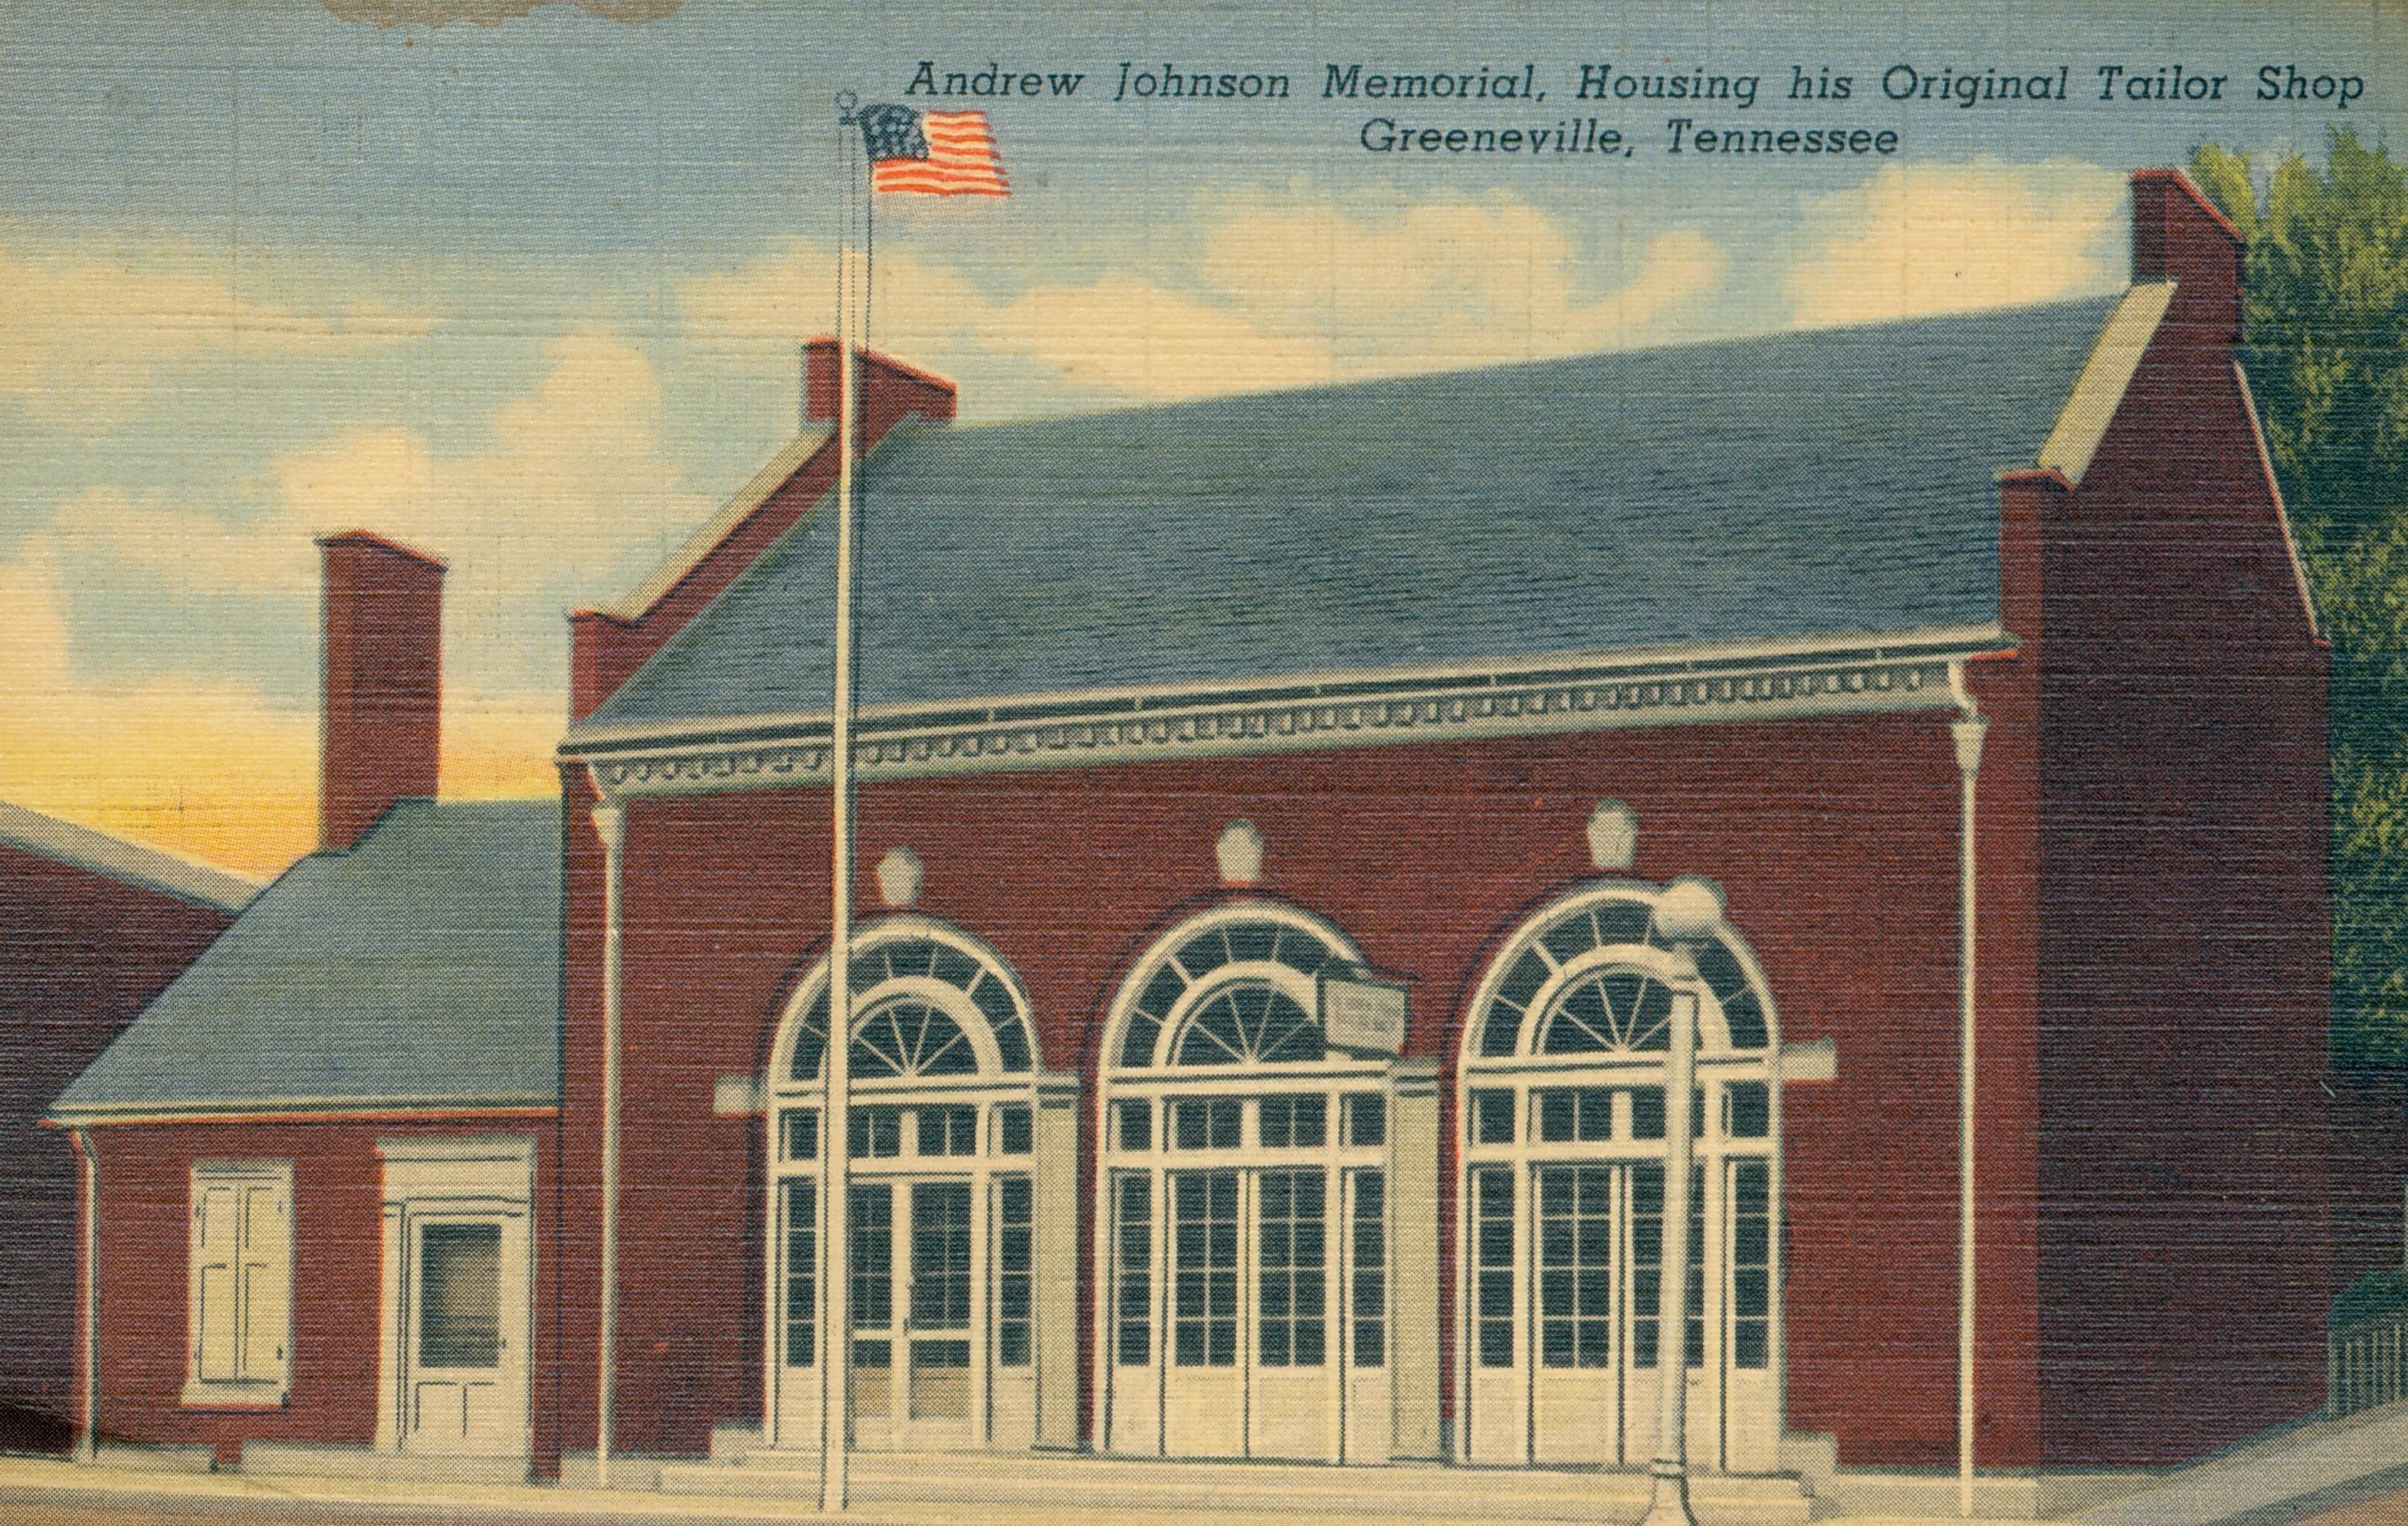 Andrew Johnson Memorial, housing his original Tailor Shop